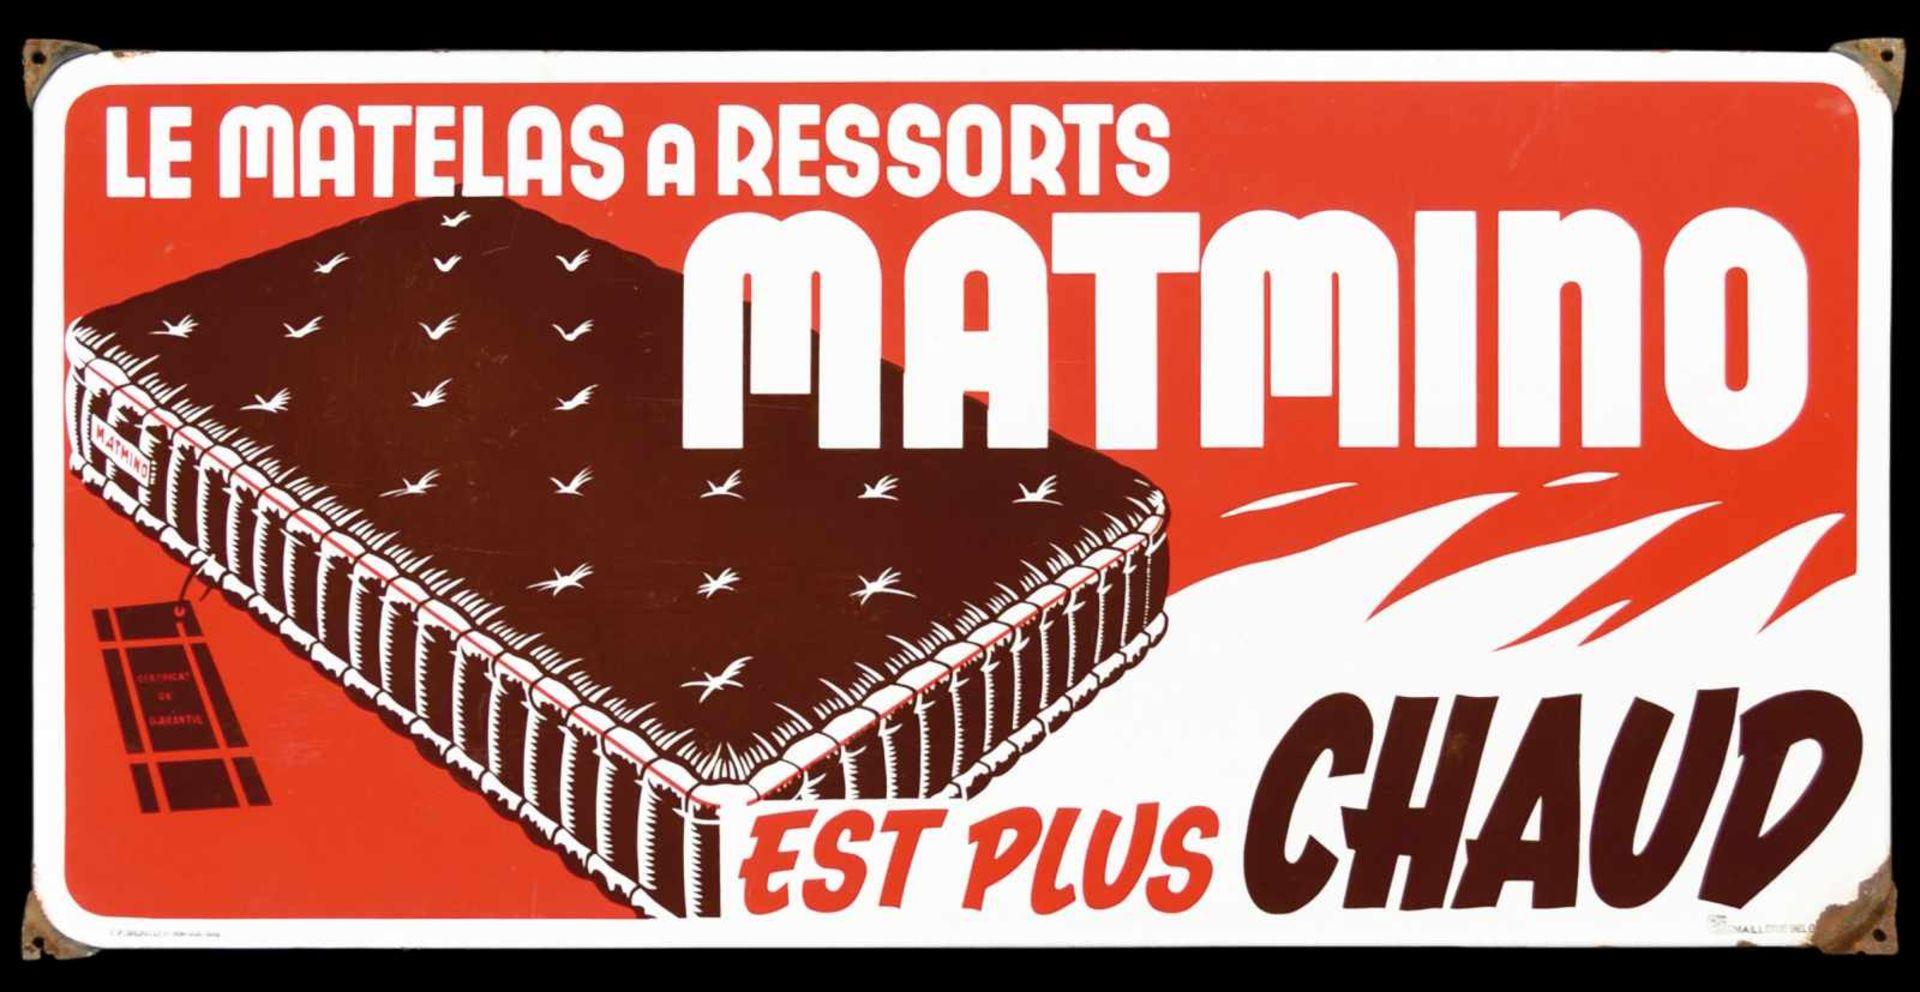 MATMINO (1-2) Emailschild, abgekantet, schabloniert, Belgien 1948, 98 x 48 cm, Emaillenrie Belge.